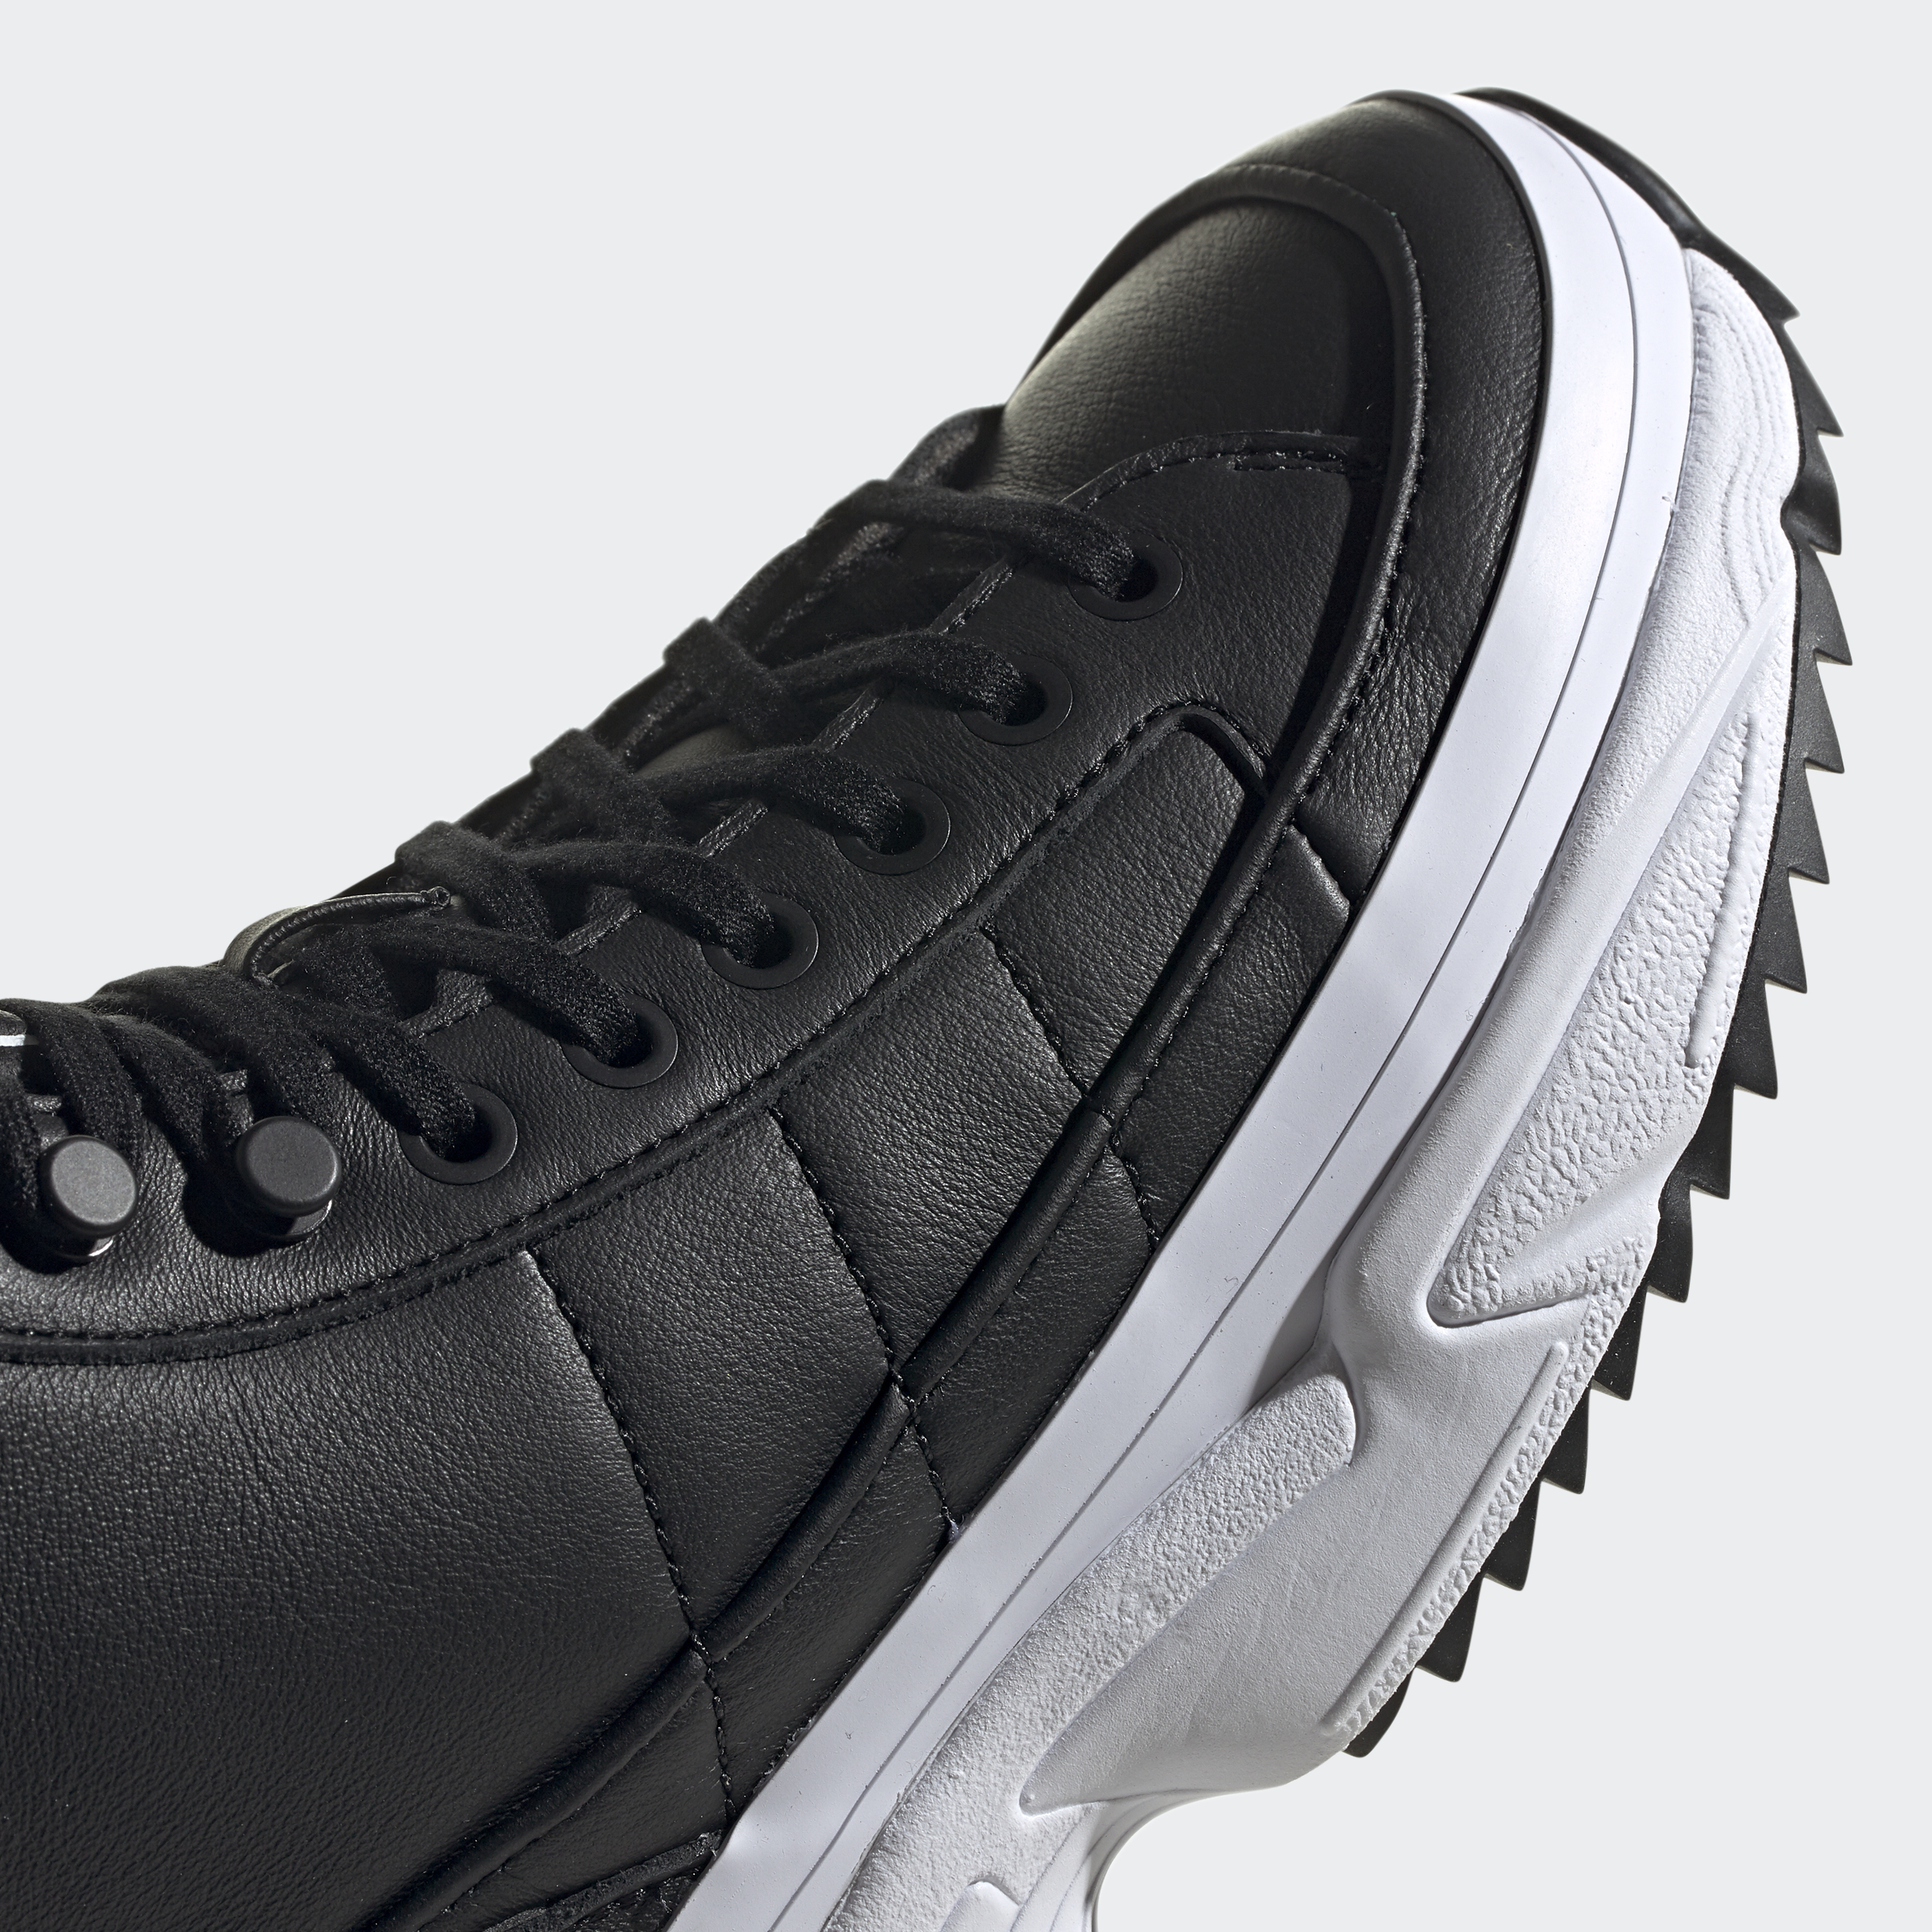 adidas-Kiellor-Xtra-Boots-Women-039-s-Boots thumbnail 16